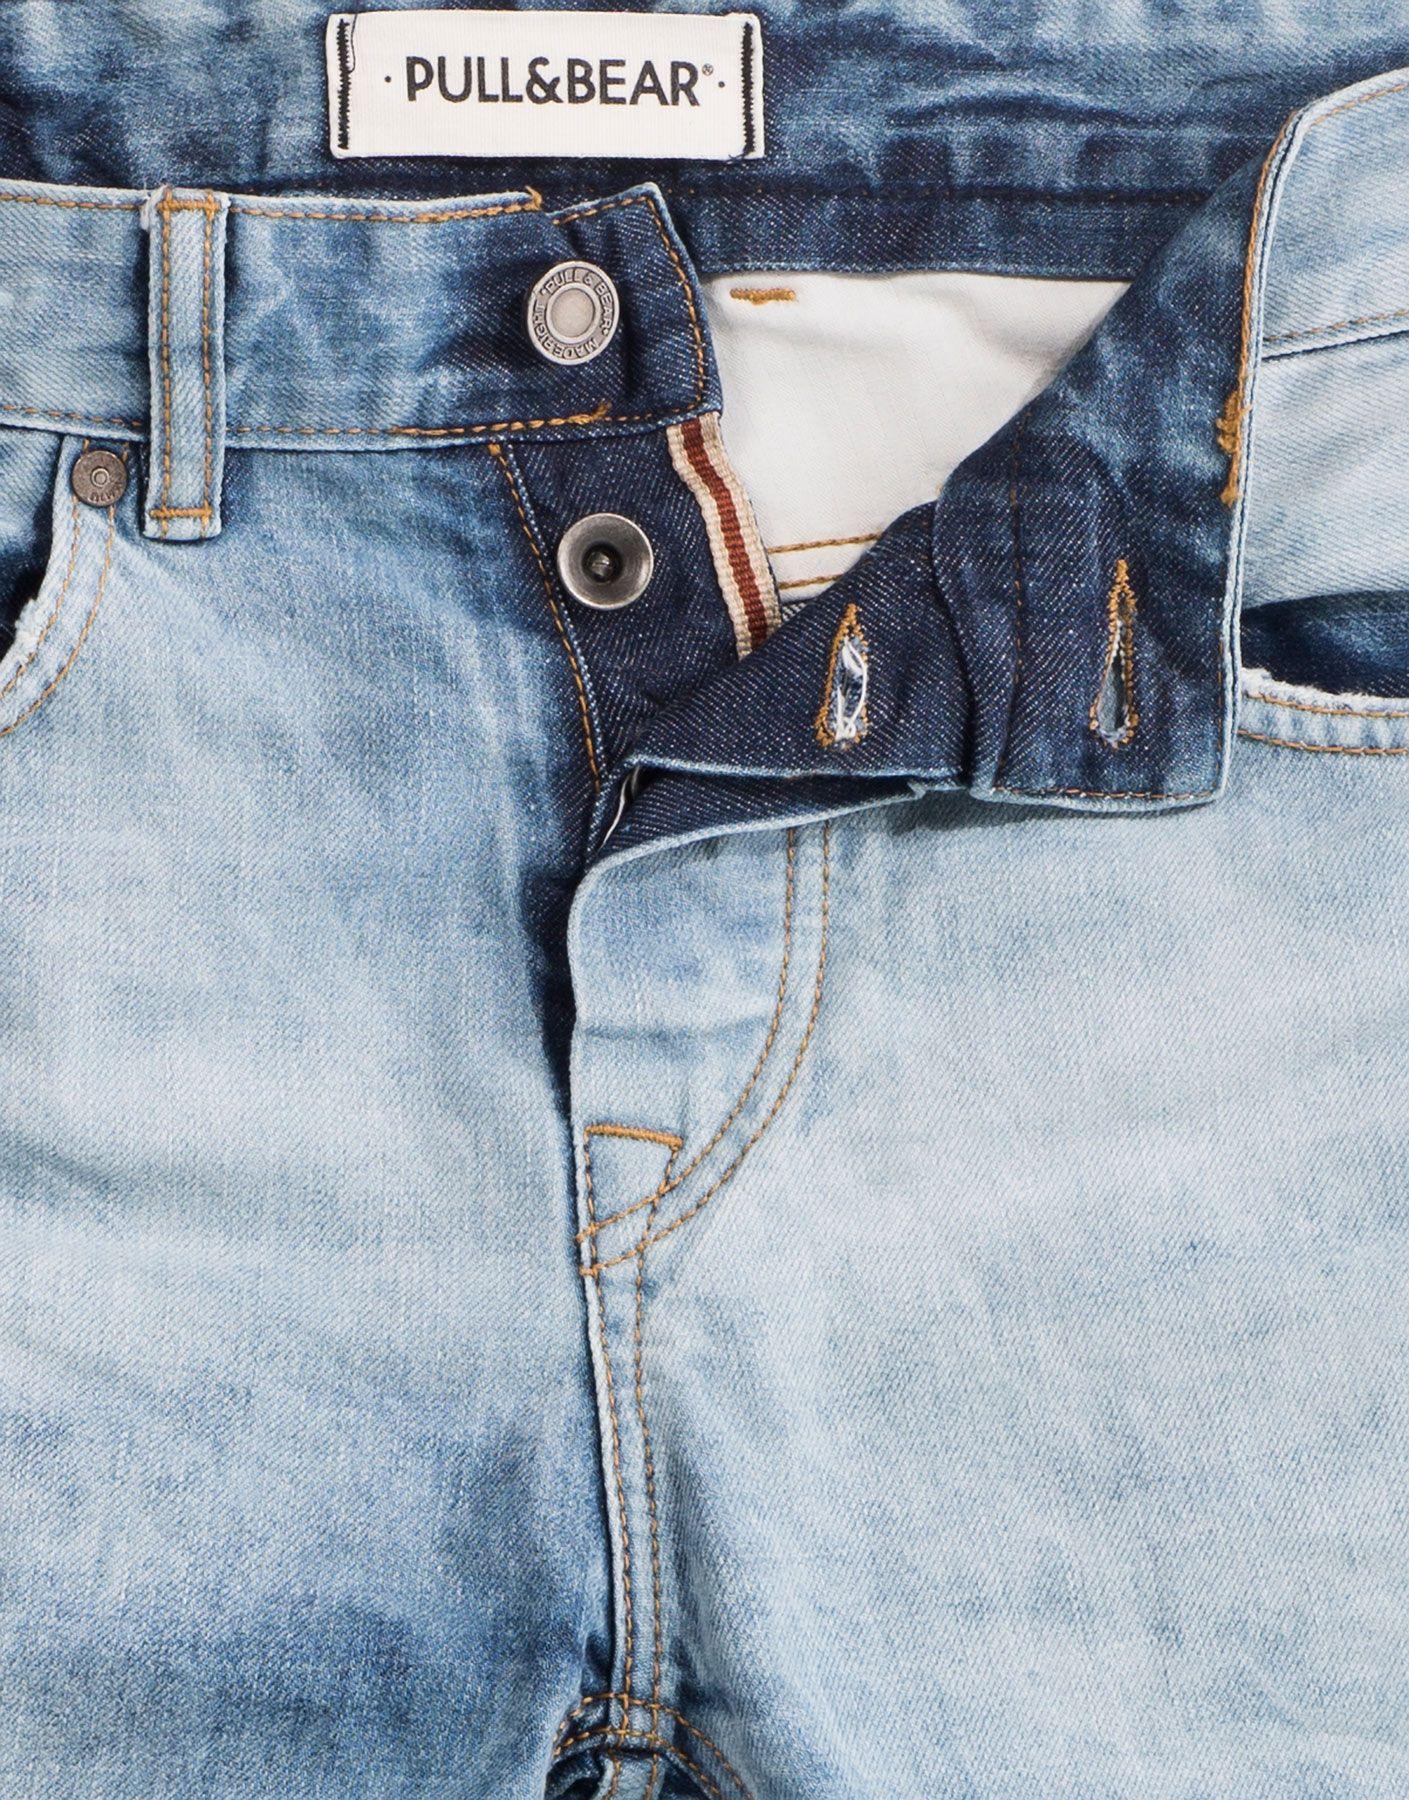 Jean Basic Slim Fit Jeans Homme Pull Bear France Light Blue Jeans Denim Details Stylish Mens Outfits